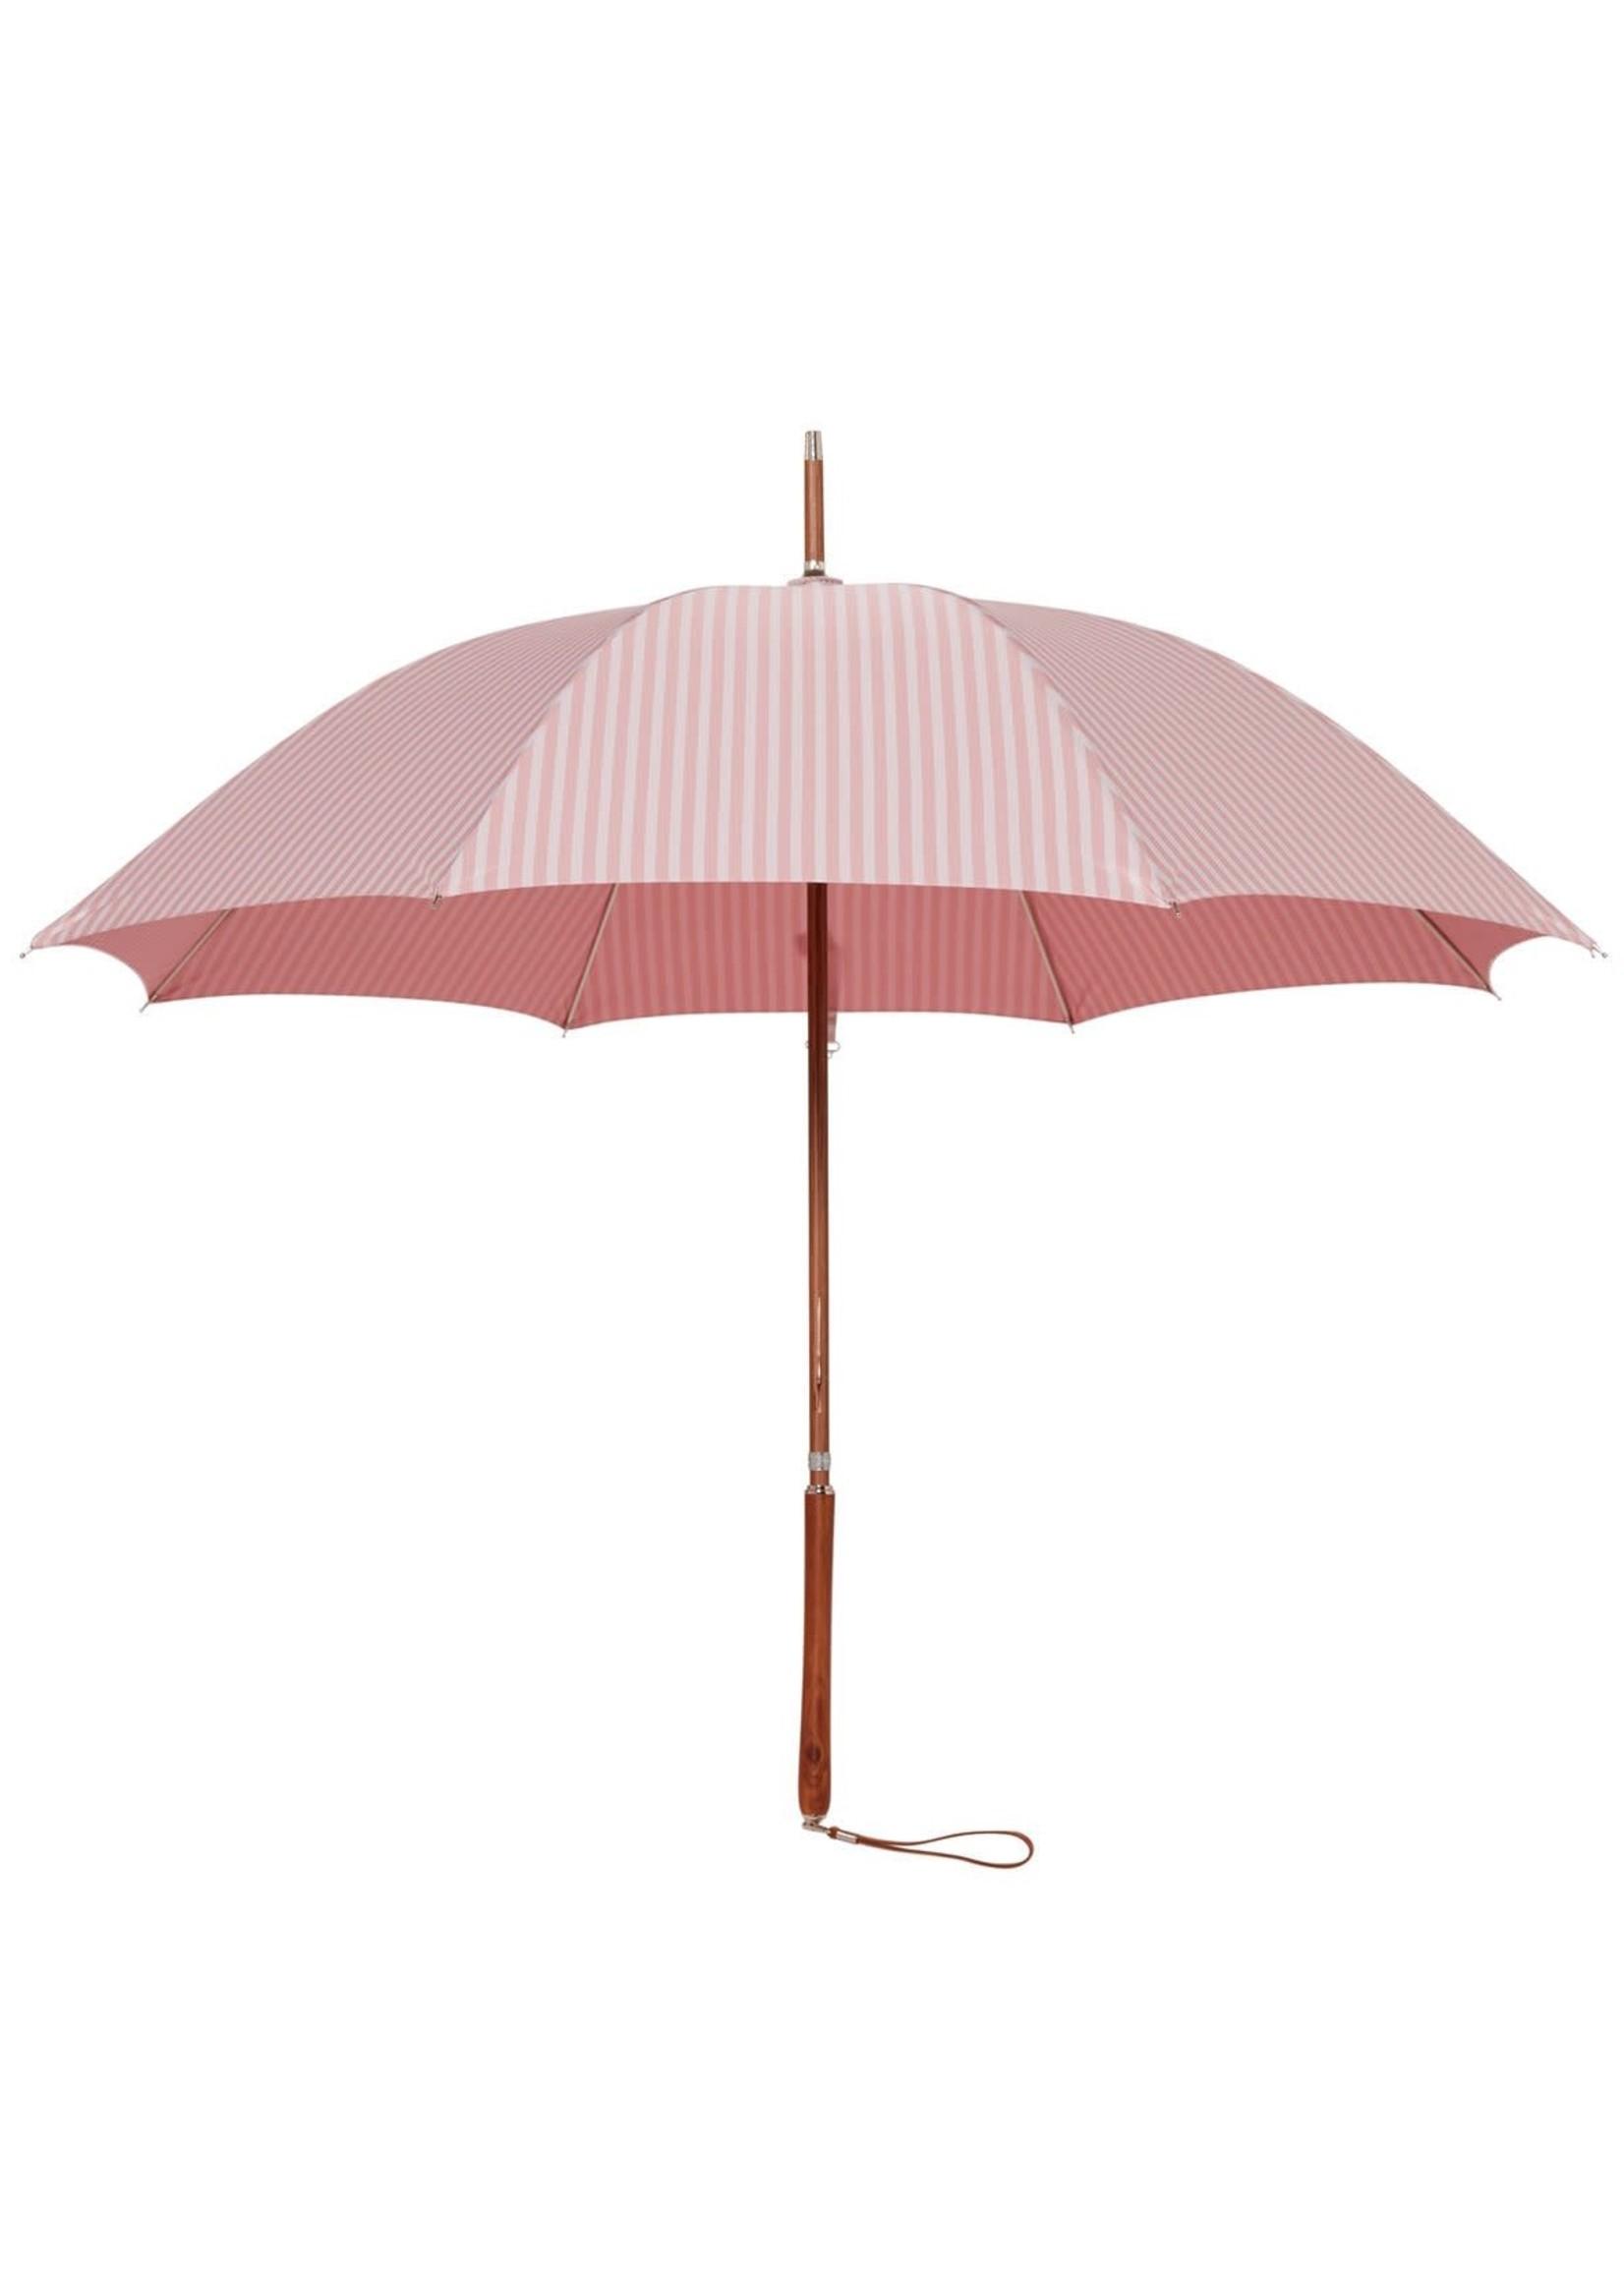 Rain Umbrella - Laurens Pink Stripe